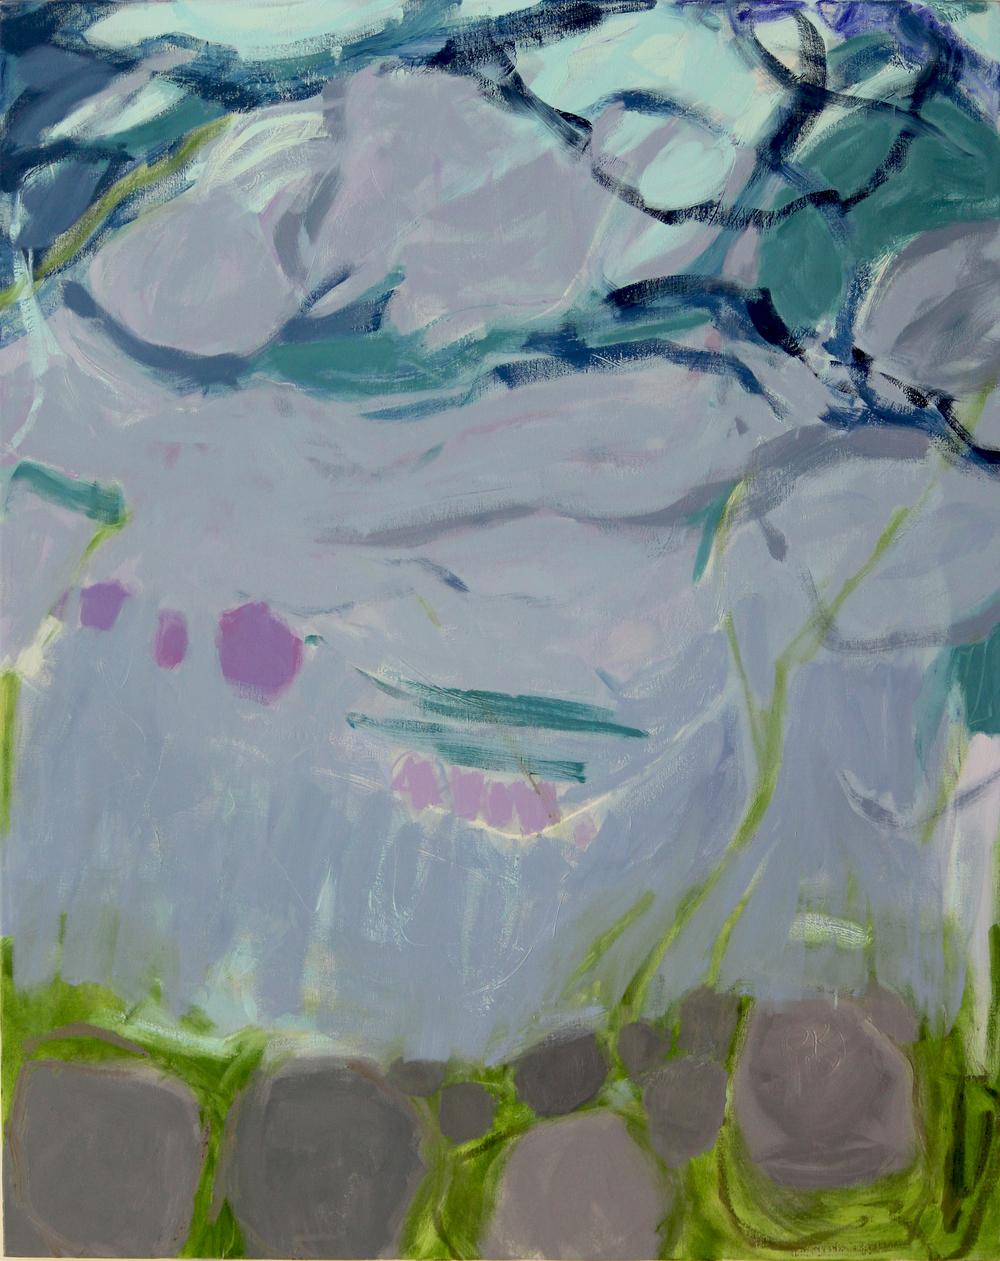 Air, moss & rocks, III